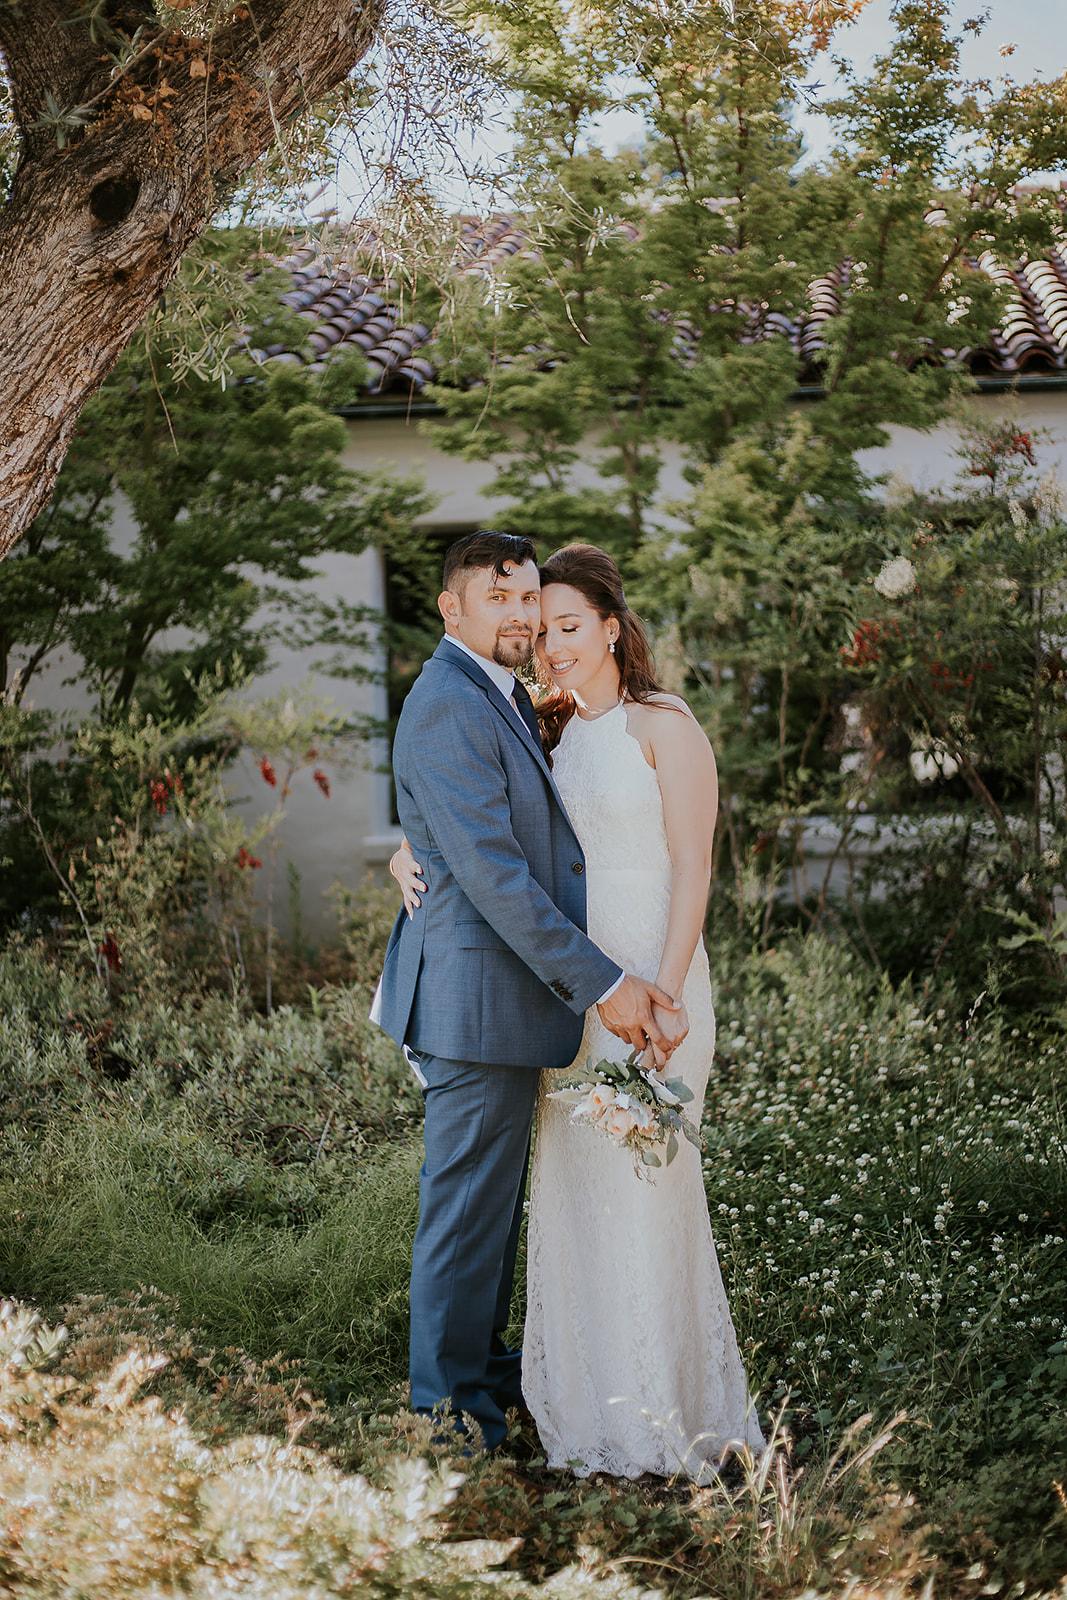 John & Alanna   Wedding